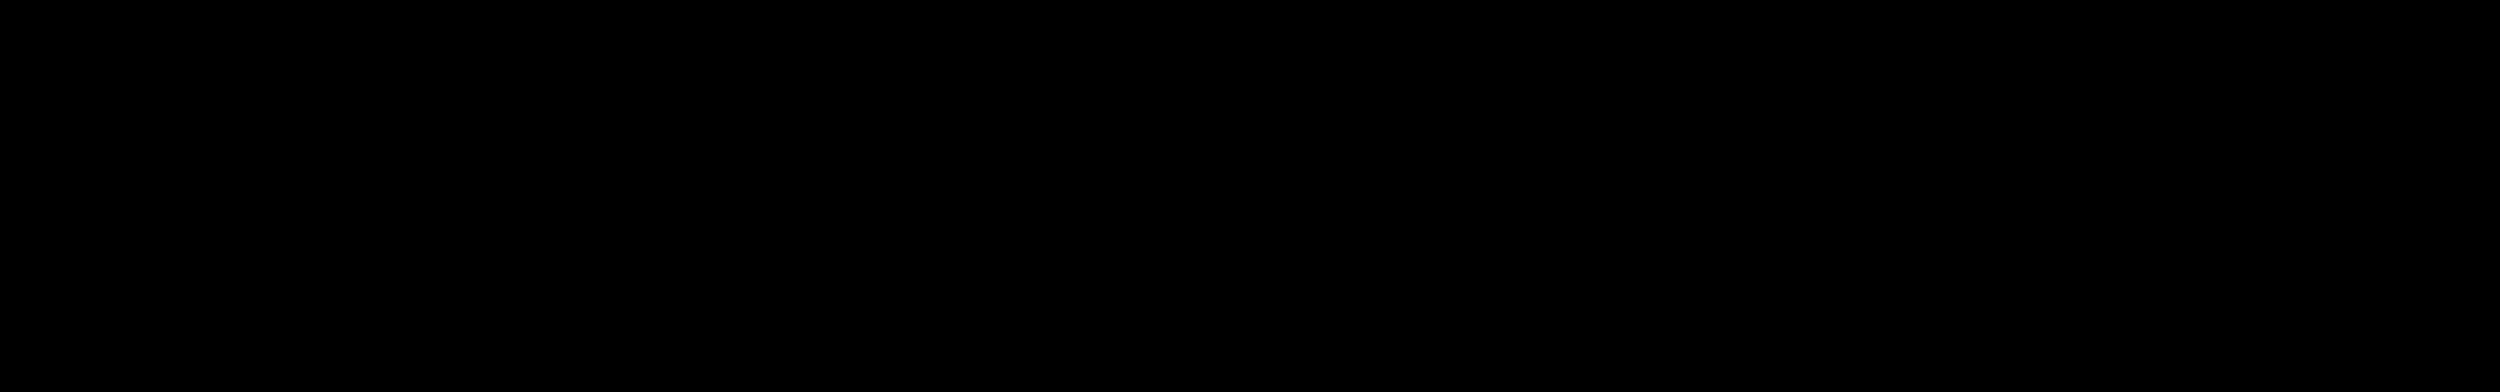 Earshots logo alts-01.png